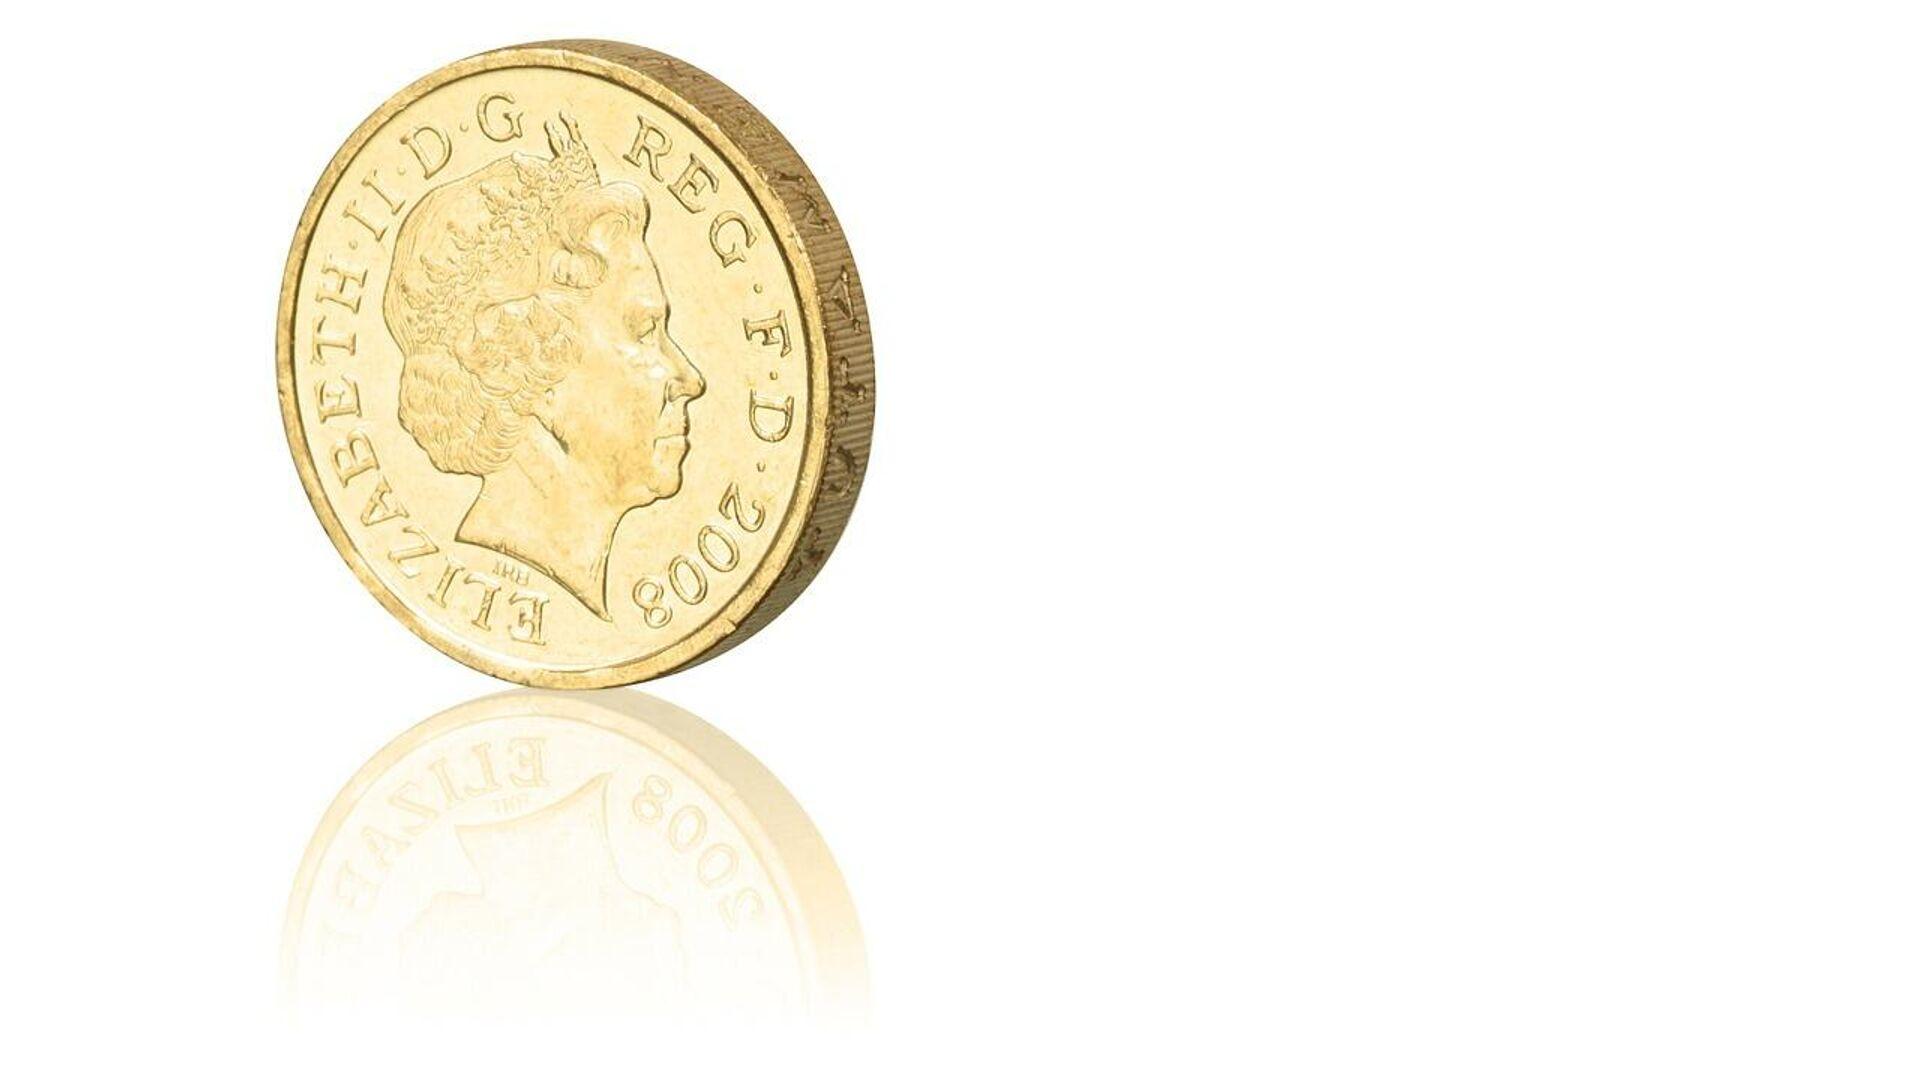 Pfund Sterling (Symbolbild) - SNA, 1920, 19.04.2021